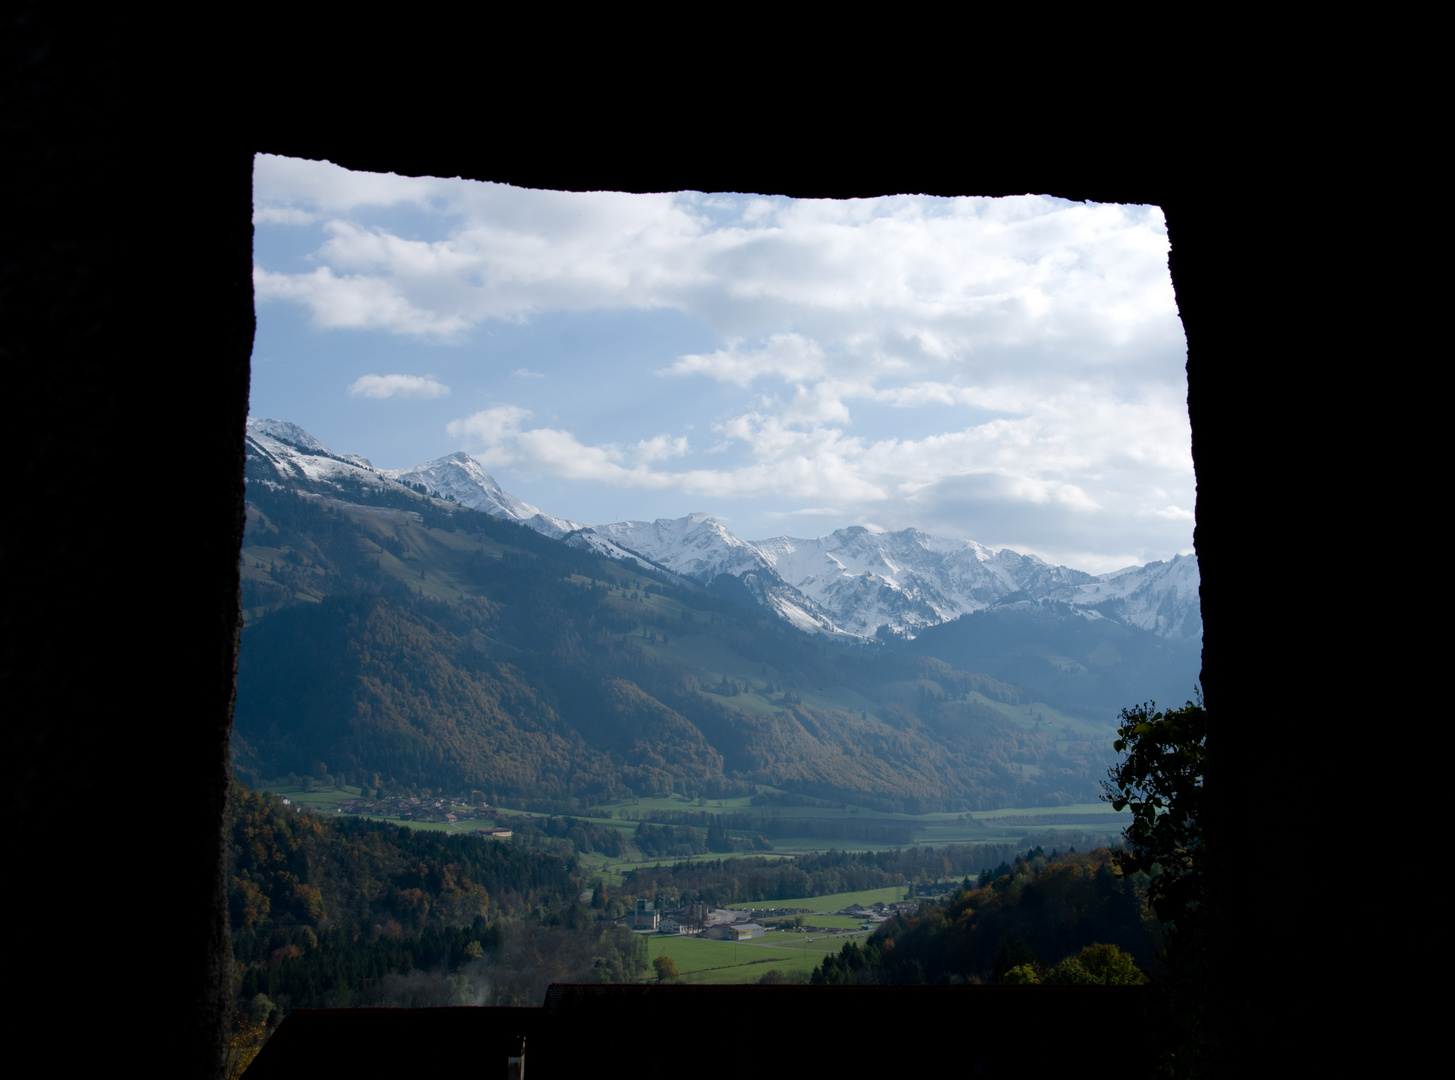 Eingerahmte Berge